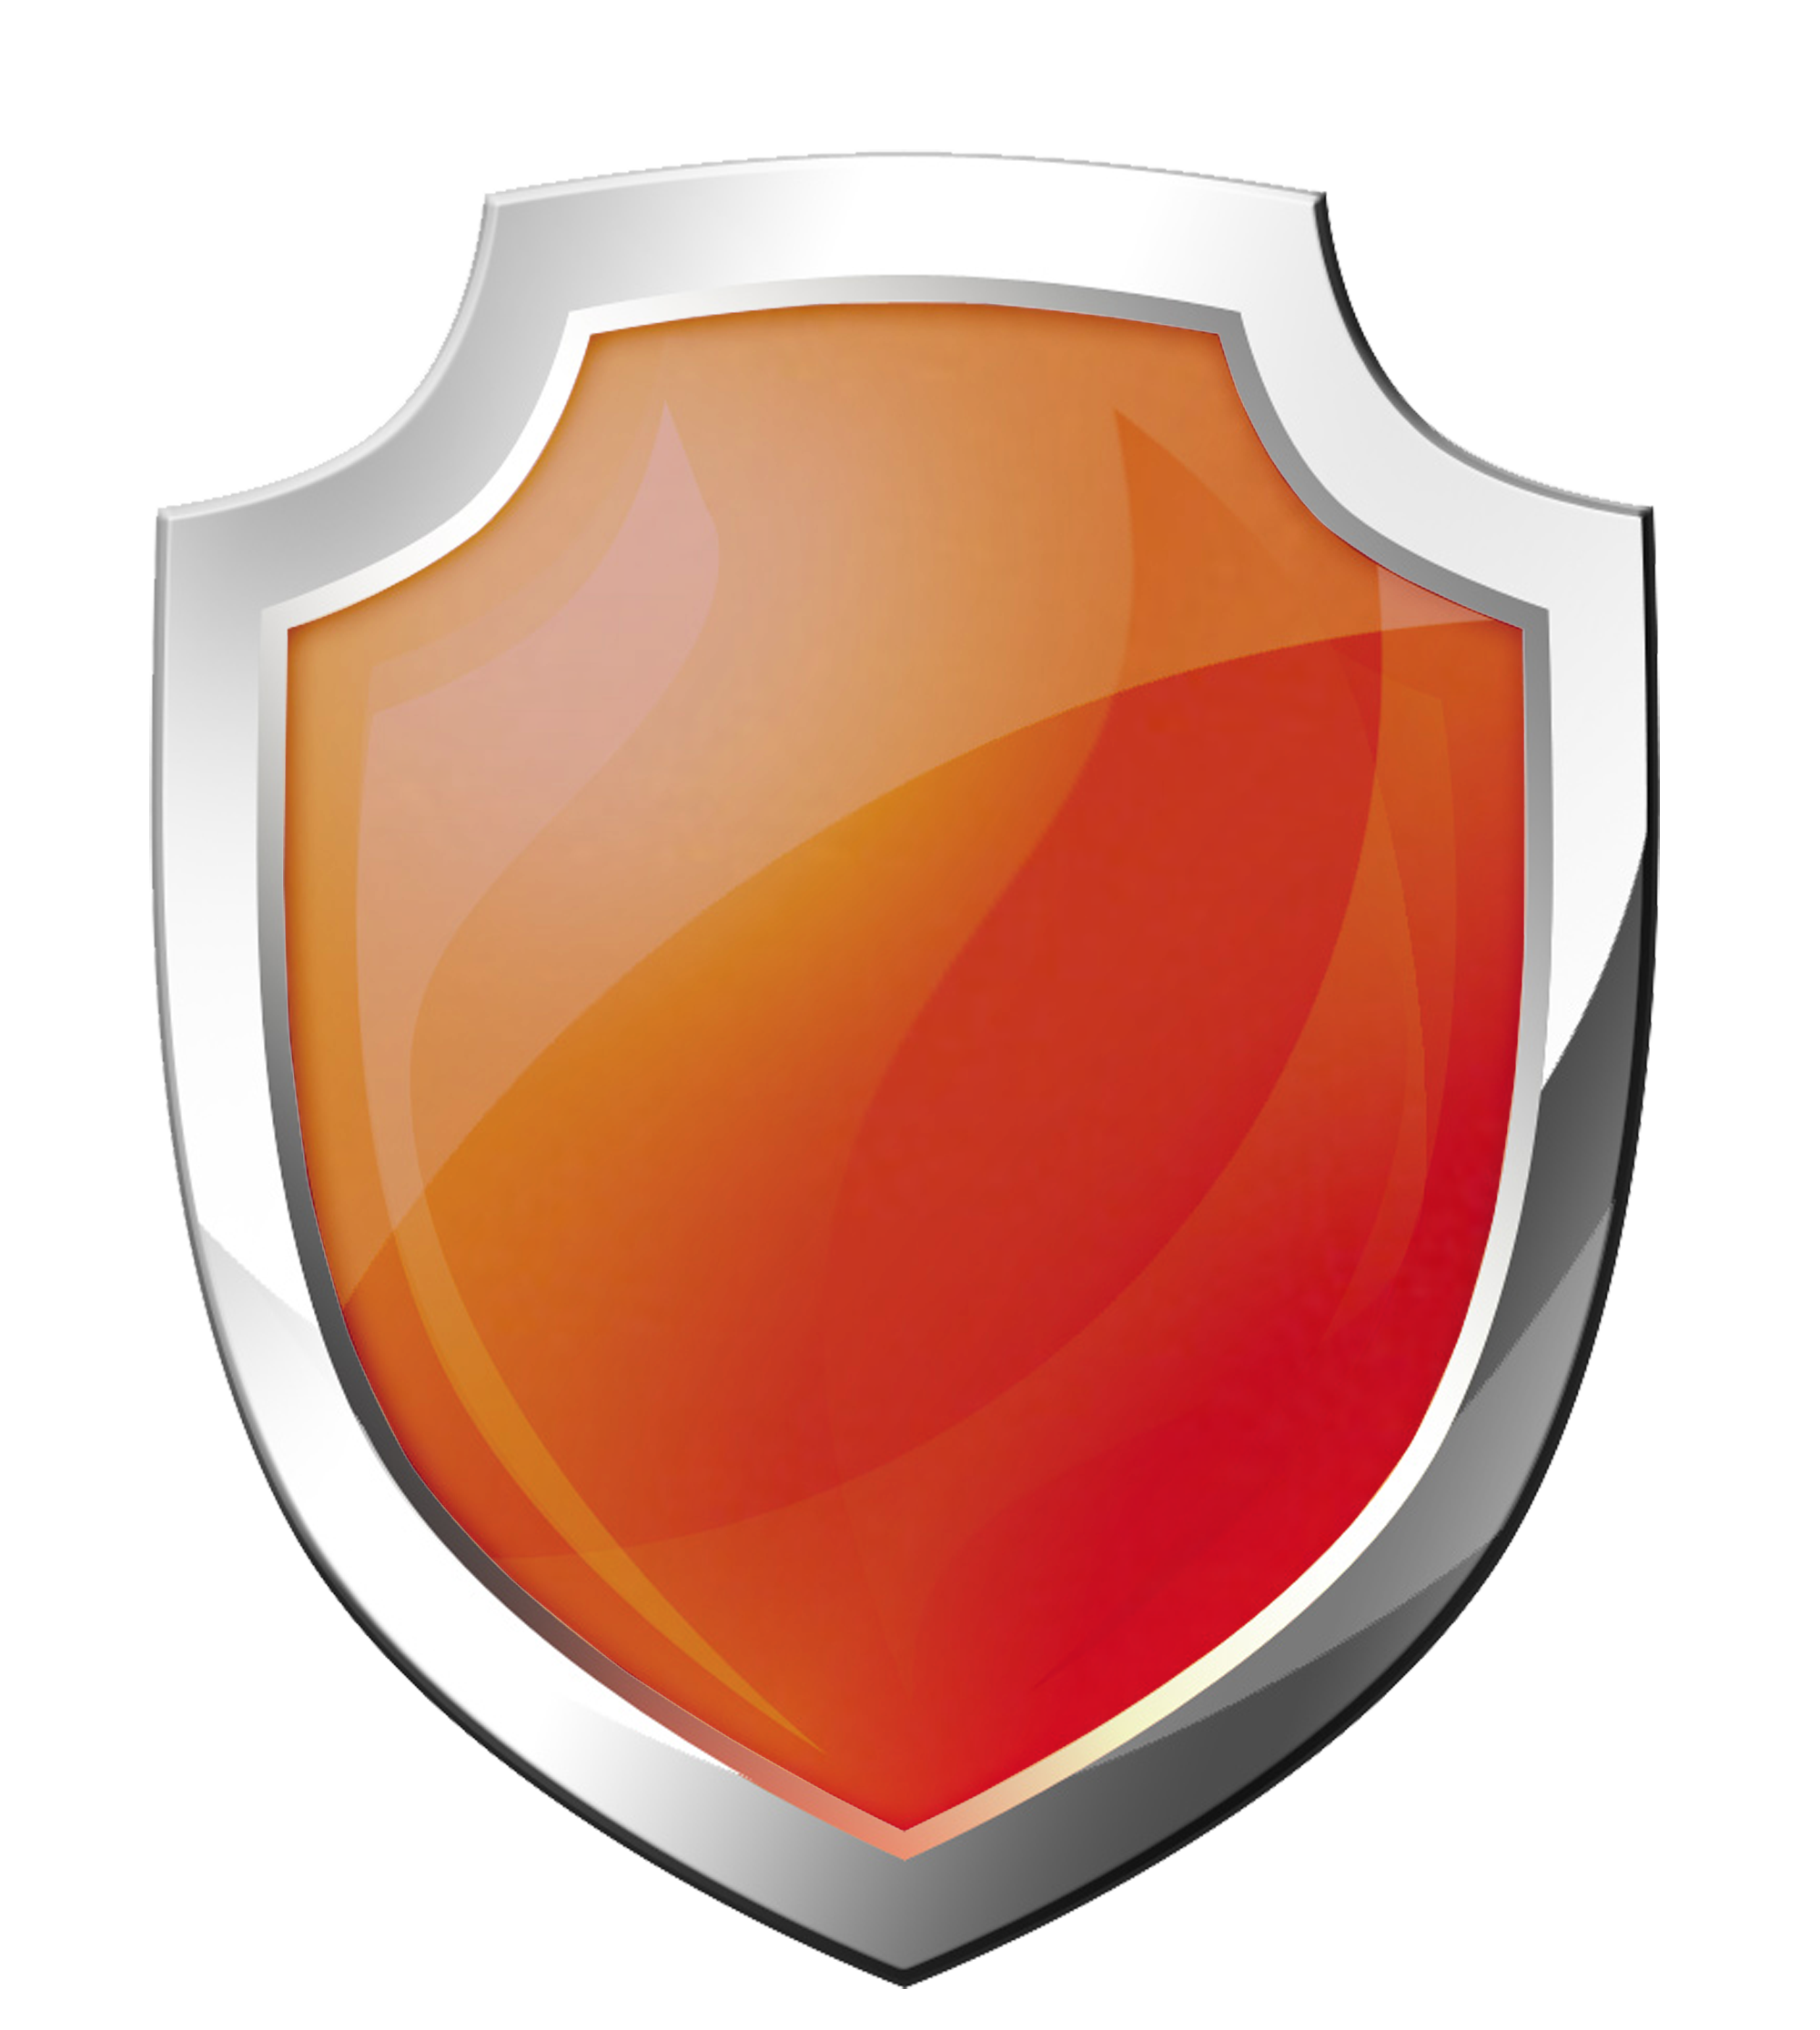 Shield PNG Image.